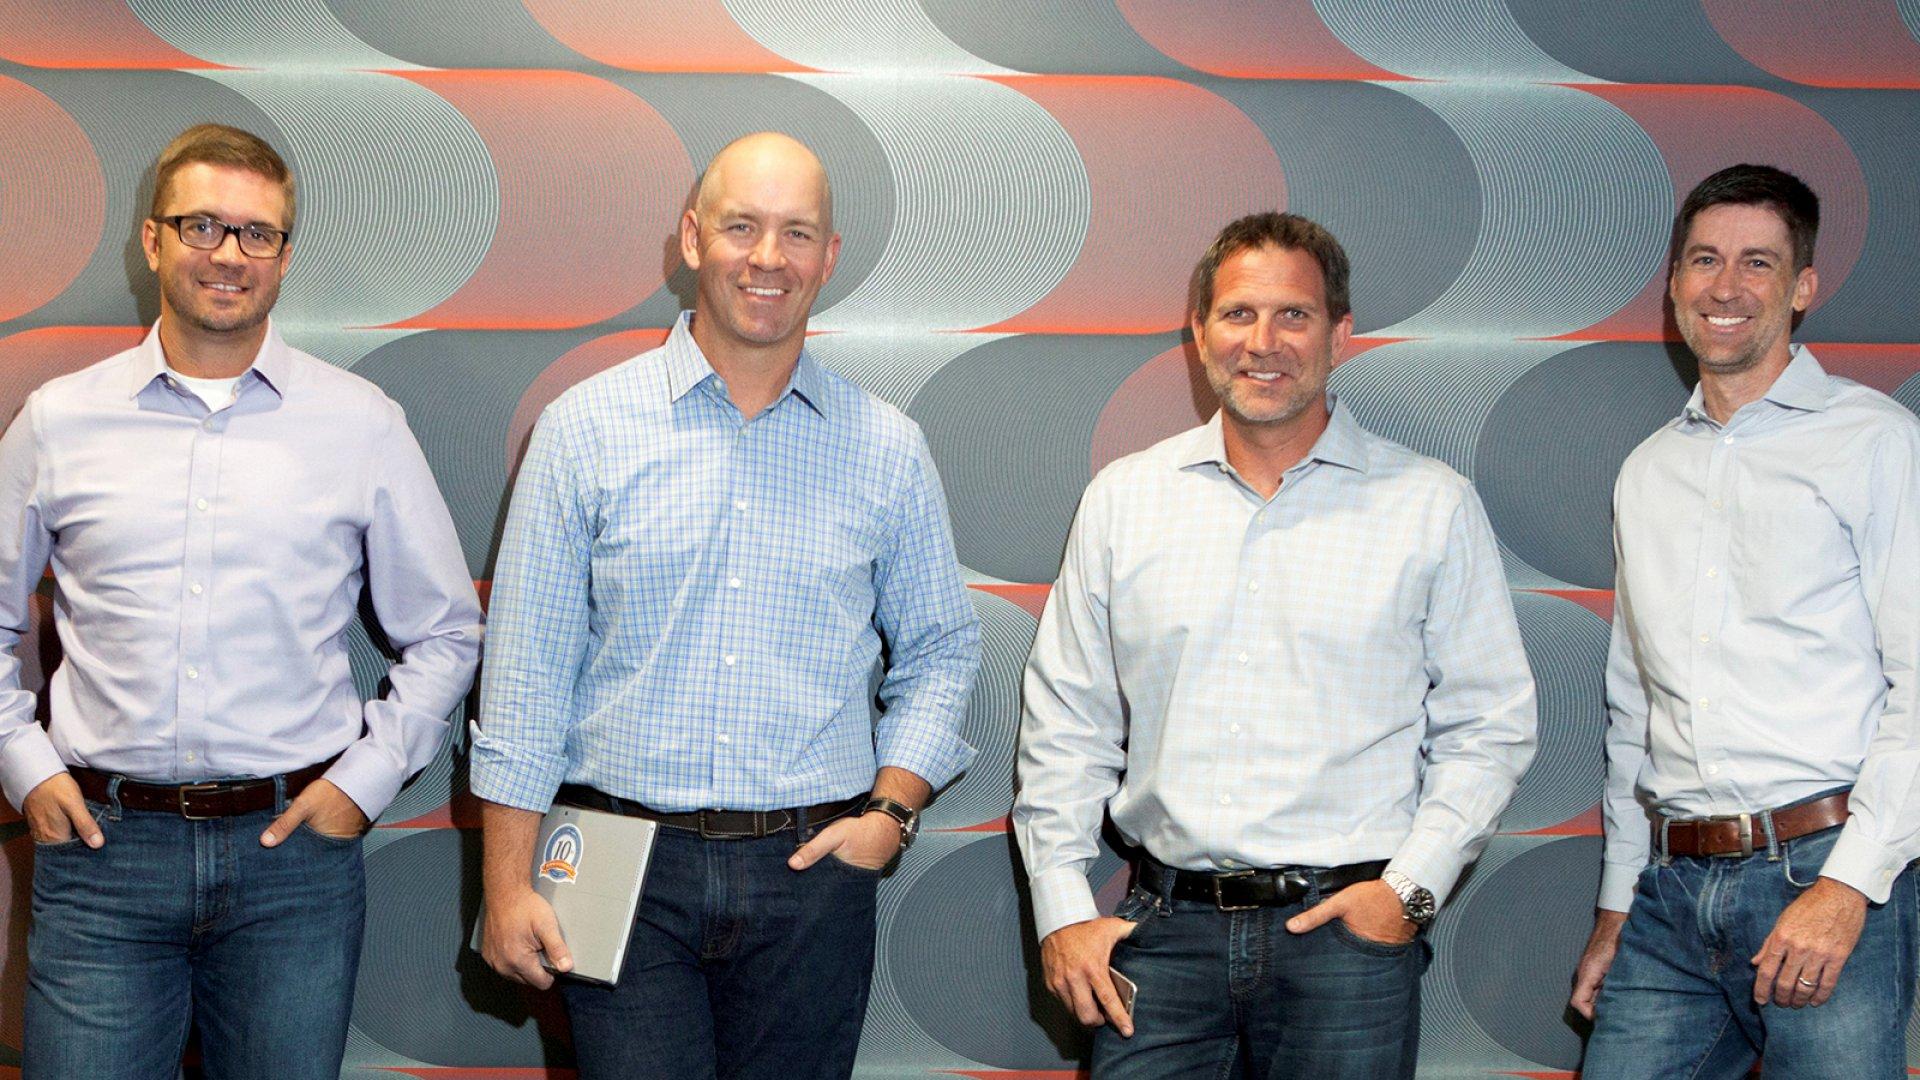 AgileThought leadership Ryan Dorrell, David Romine, Jeff Alagood, and John Wagner.